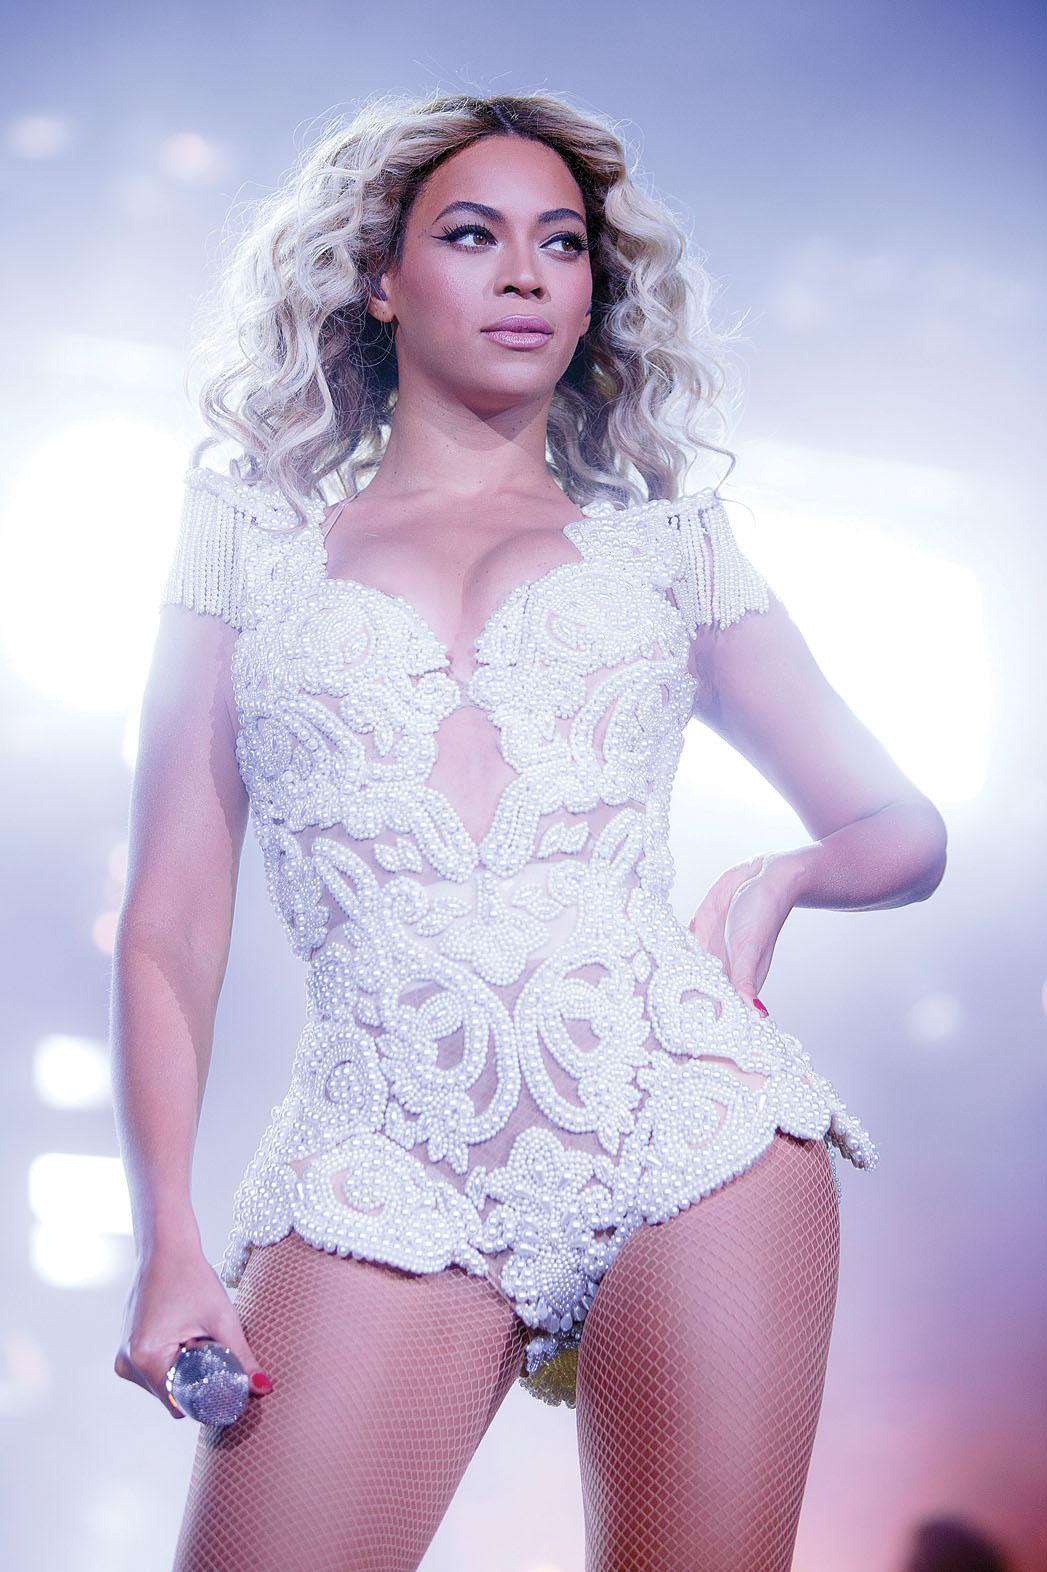 No. 11: Beyonce Hones the Art of the Album Stunt